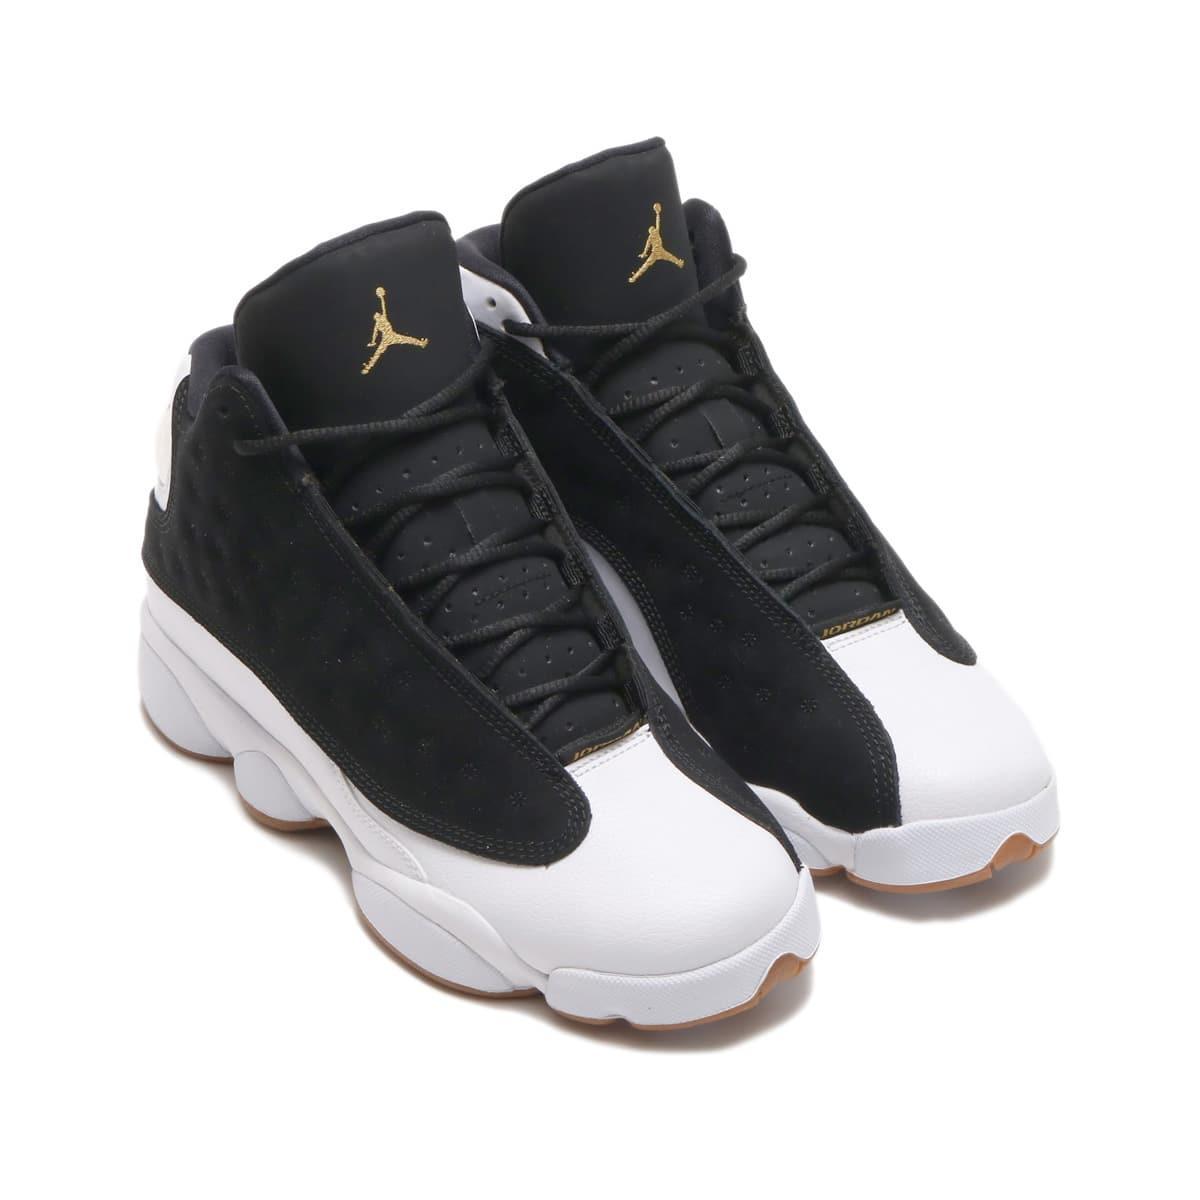 buy popular 0d830 2cdde meet d0ad3 b2511 gum 021 gs chaussures nike black white 13 ...